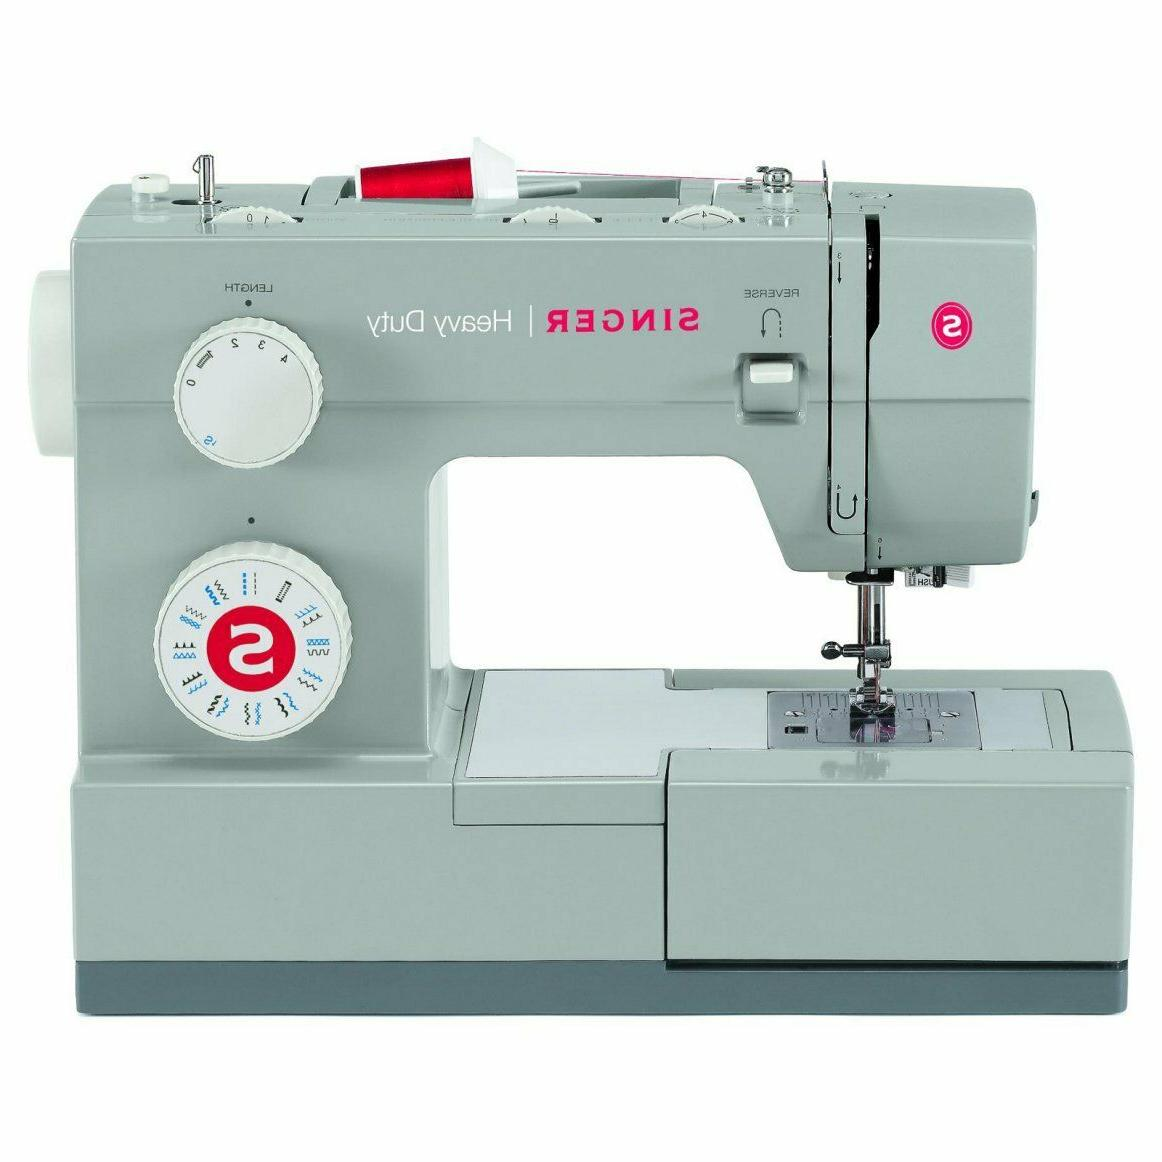 NEW SINGER 4423 Heavy Duty Model Sewing Machine FREE SHIPPIN